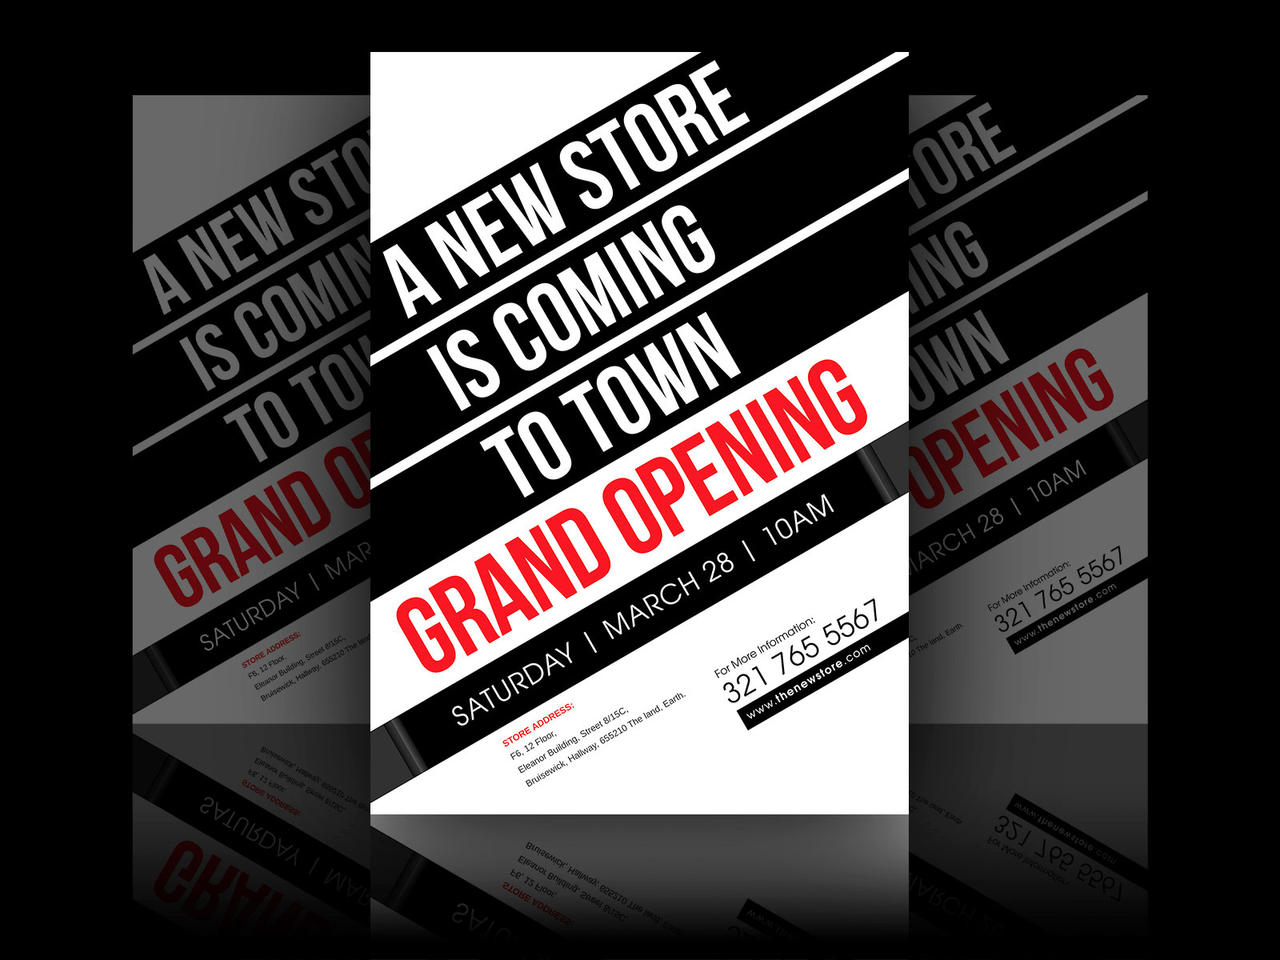 New store flyer militaryalicious new store grand opening flyer by soulmemoria on deviantart saigontimesfo